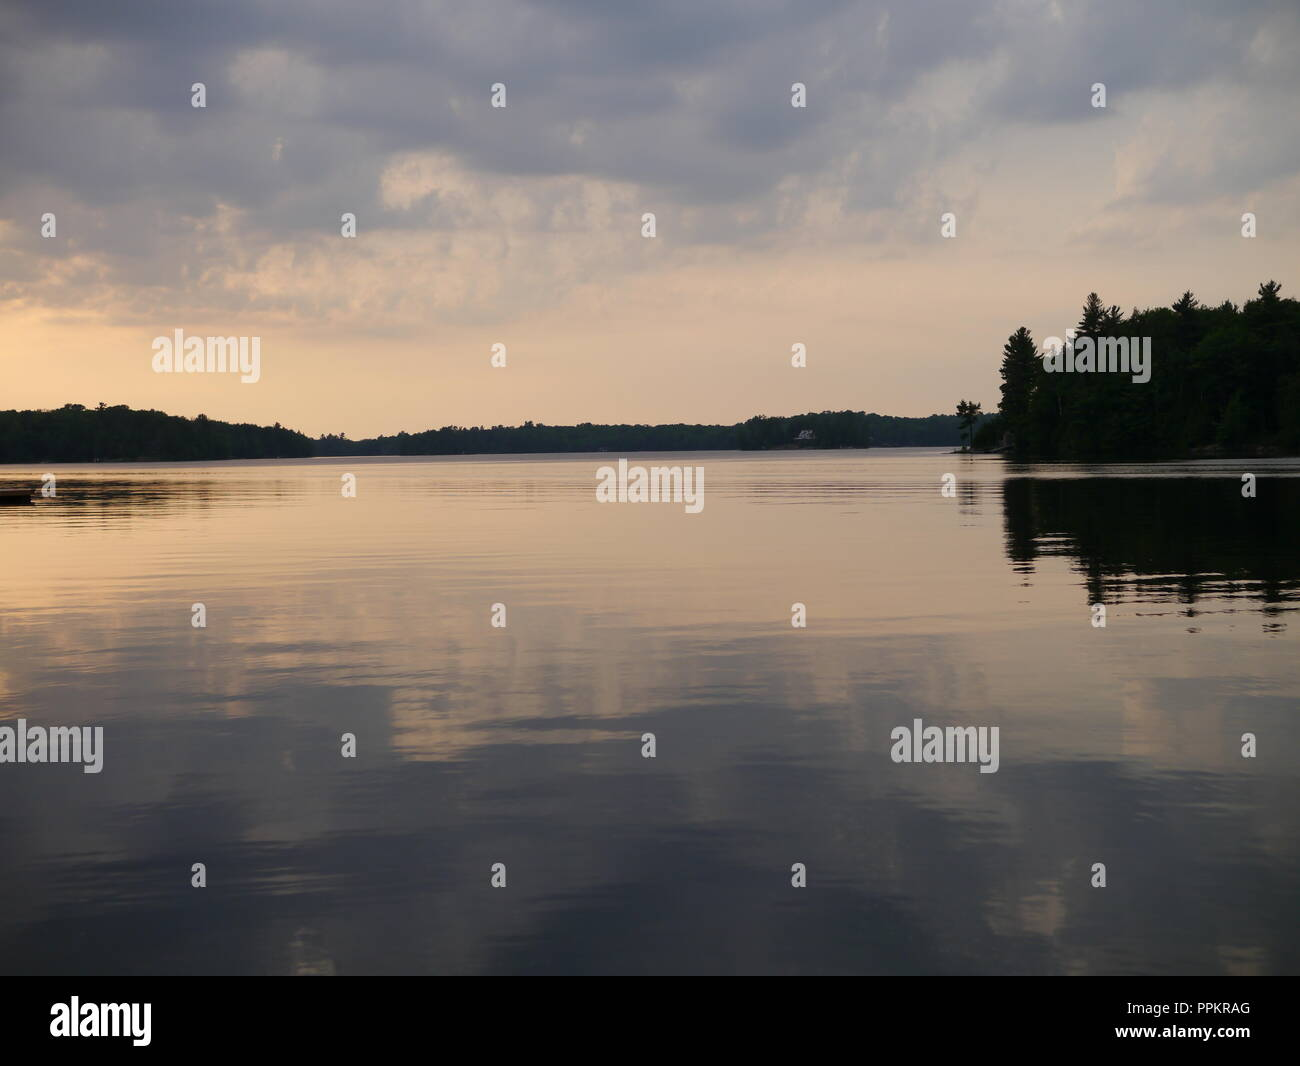 Solitude on the Lake - Stock Image